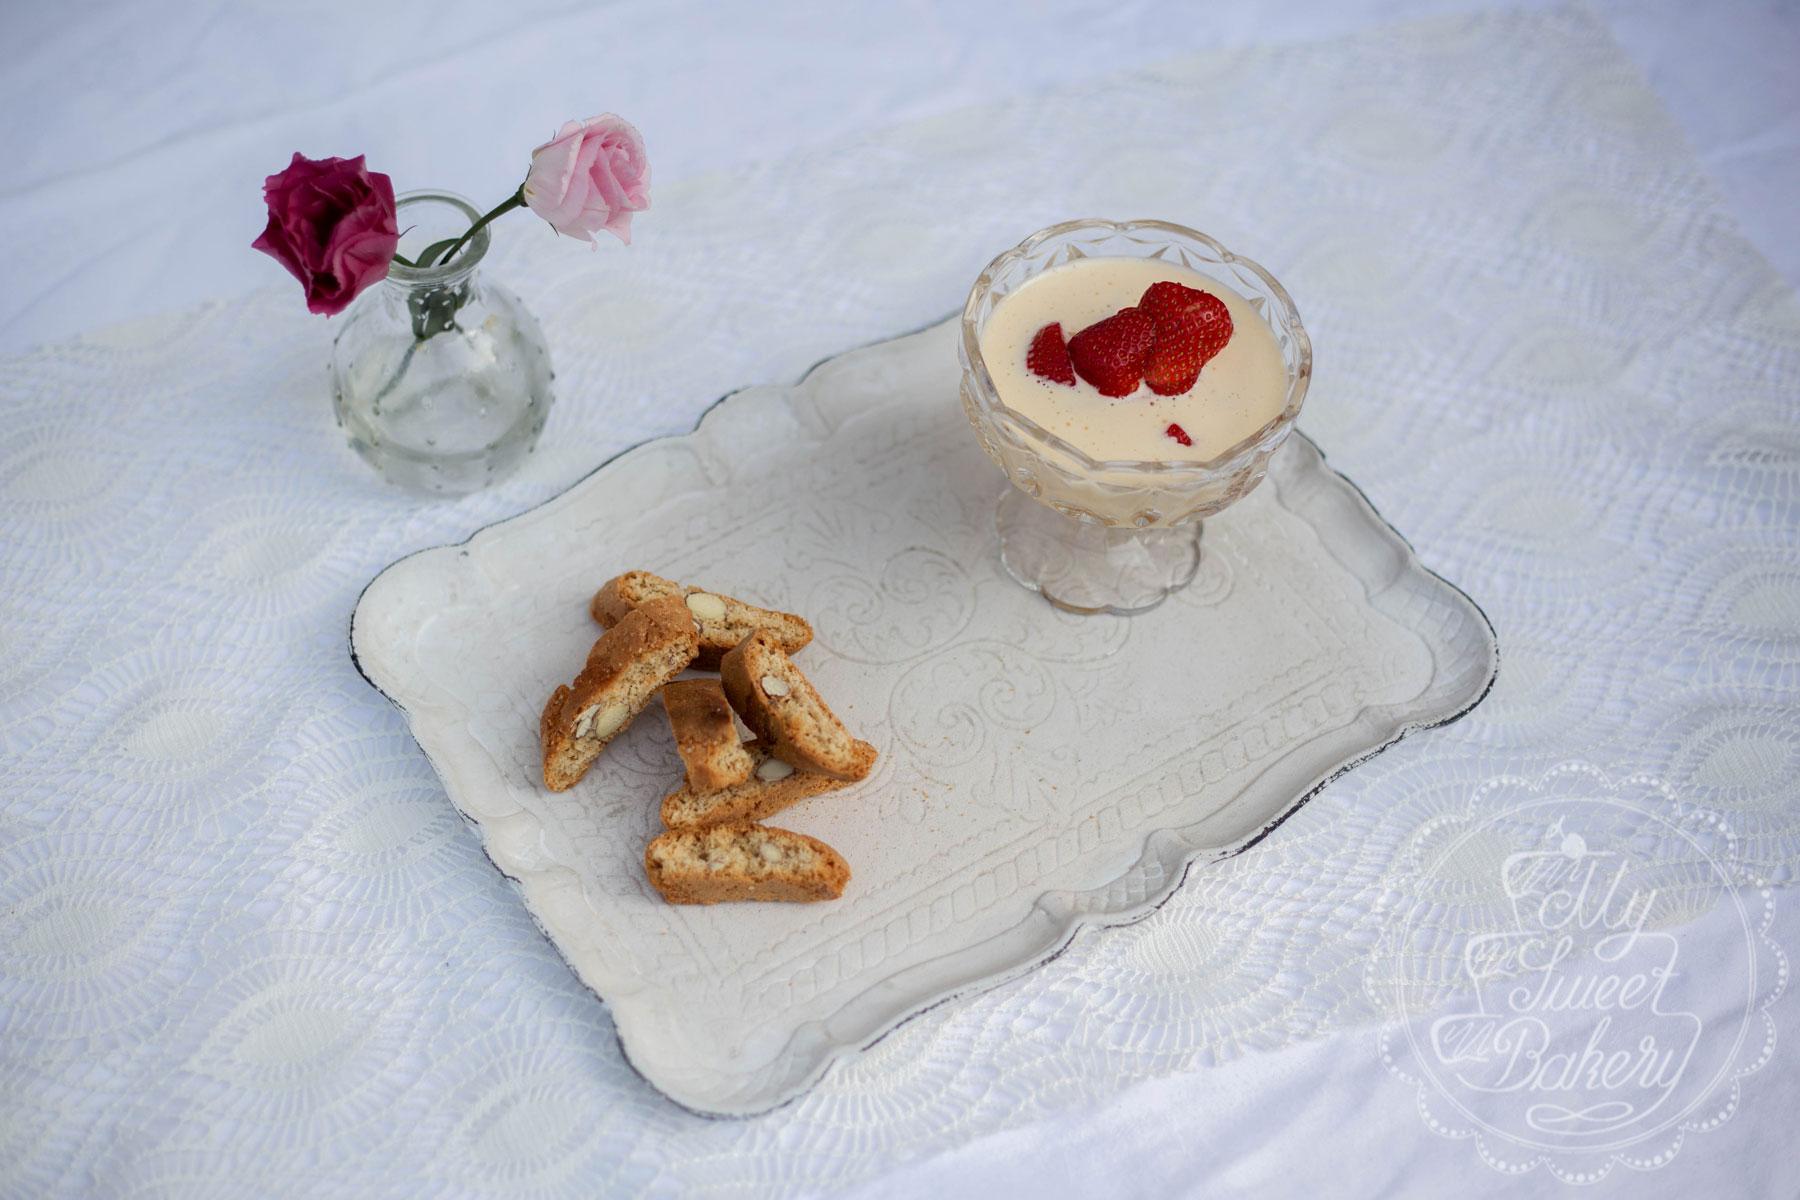 Weinschaumcreme mit Erdbeeren by My Sweet Bakery | A Little Fashion | www.a-little-fashion.com/food/weinschaumcreme-mit-frischen-erdbeeren